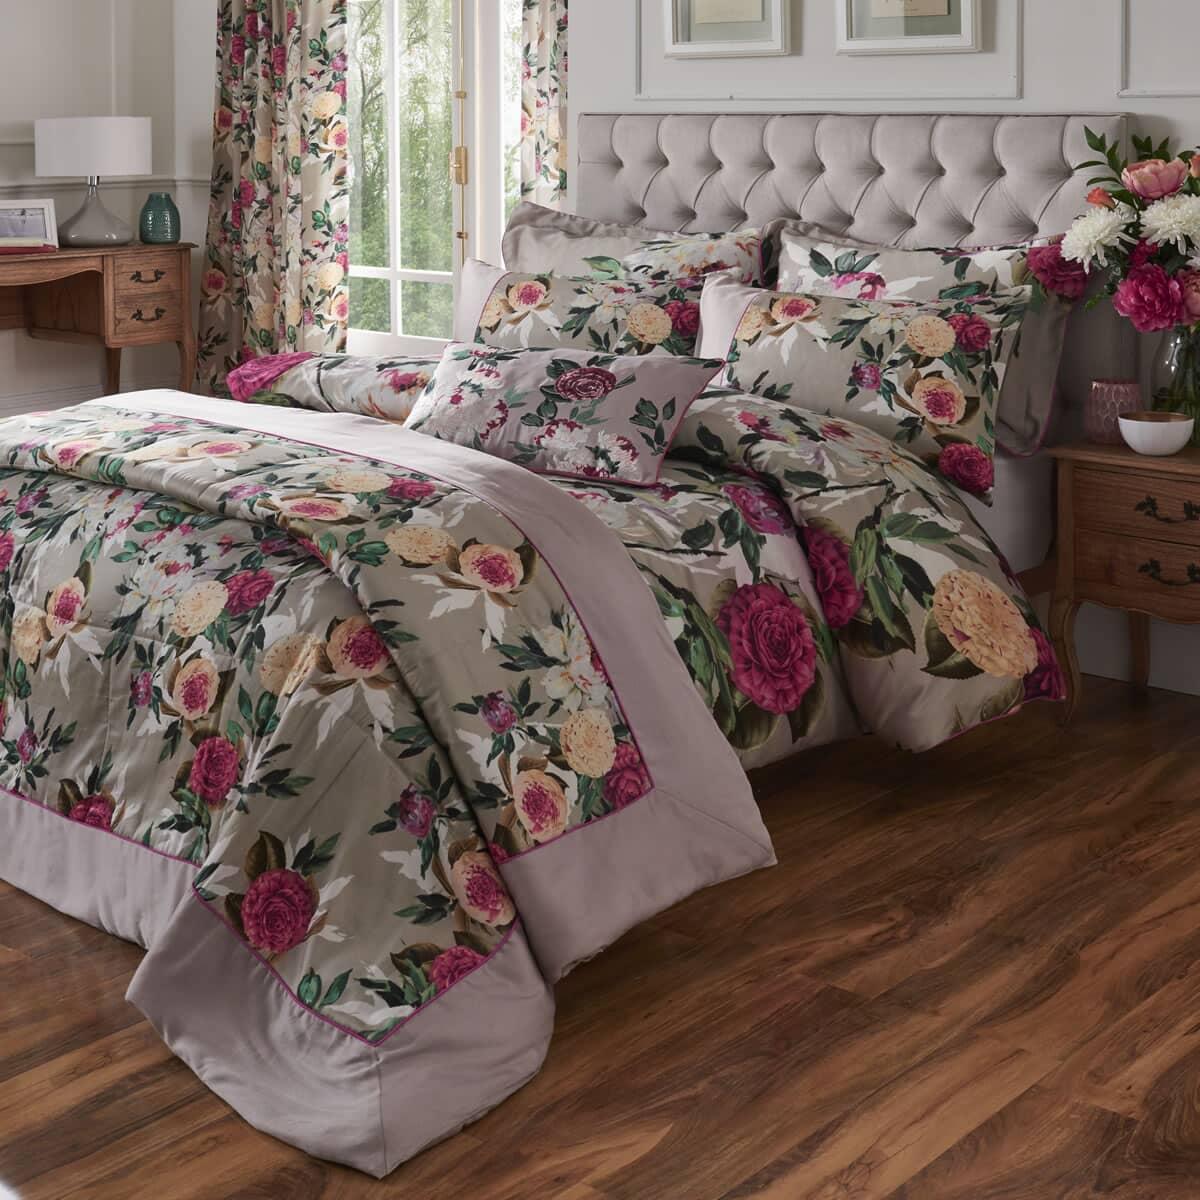 Dorma Bedding Clearance Sale